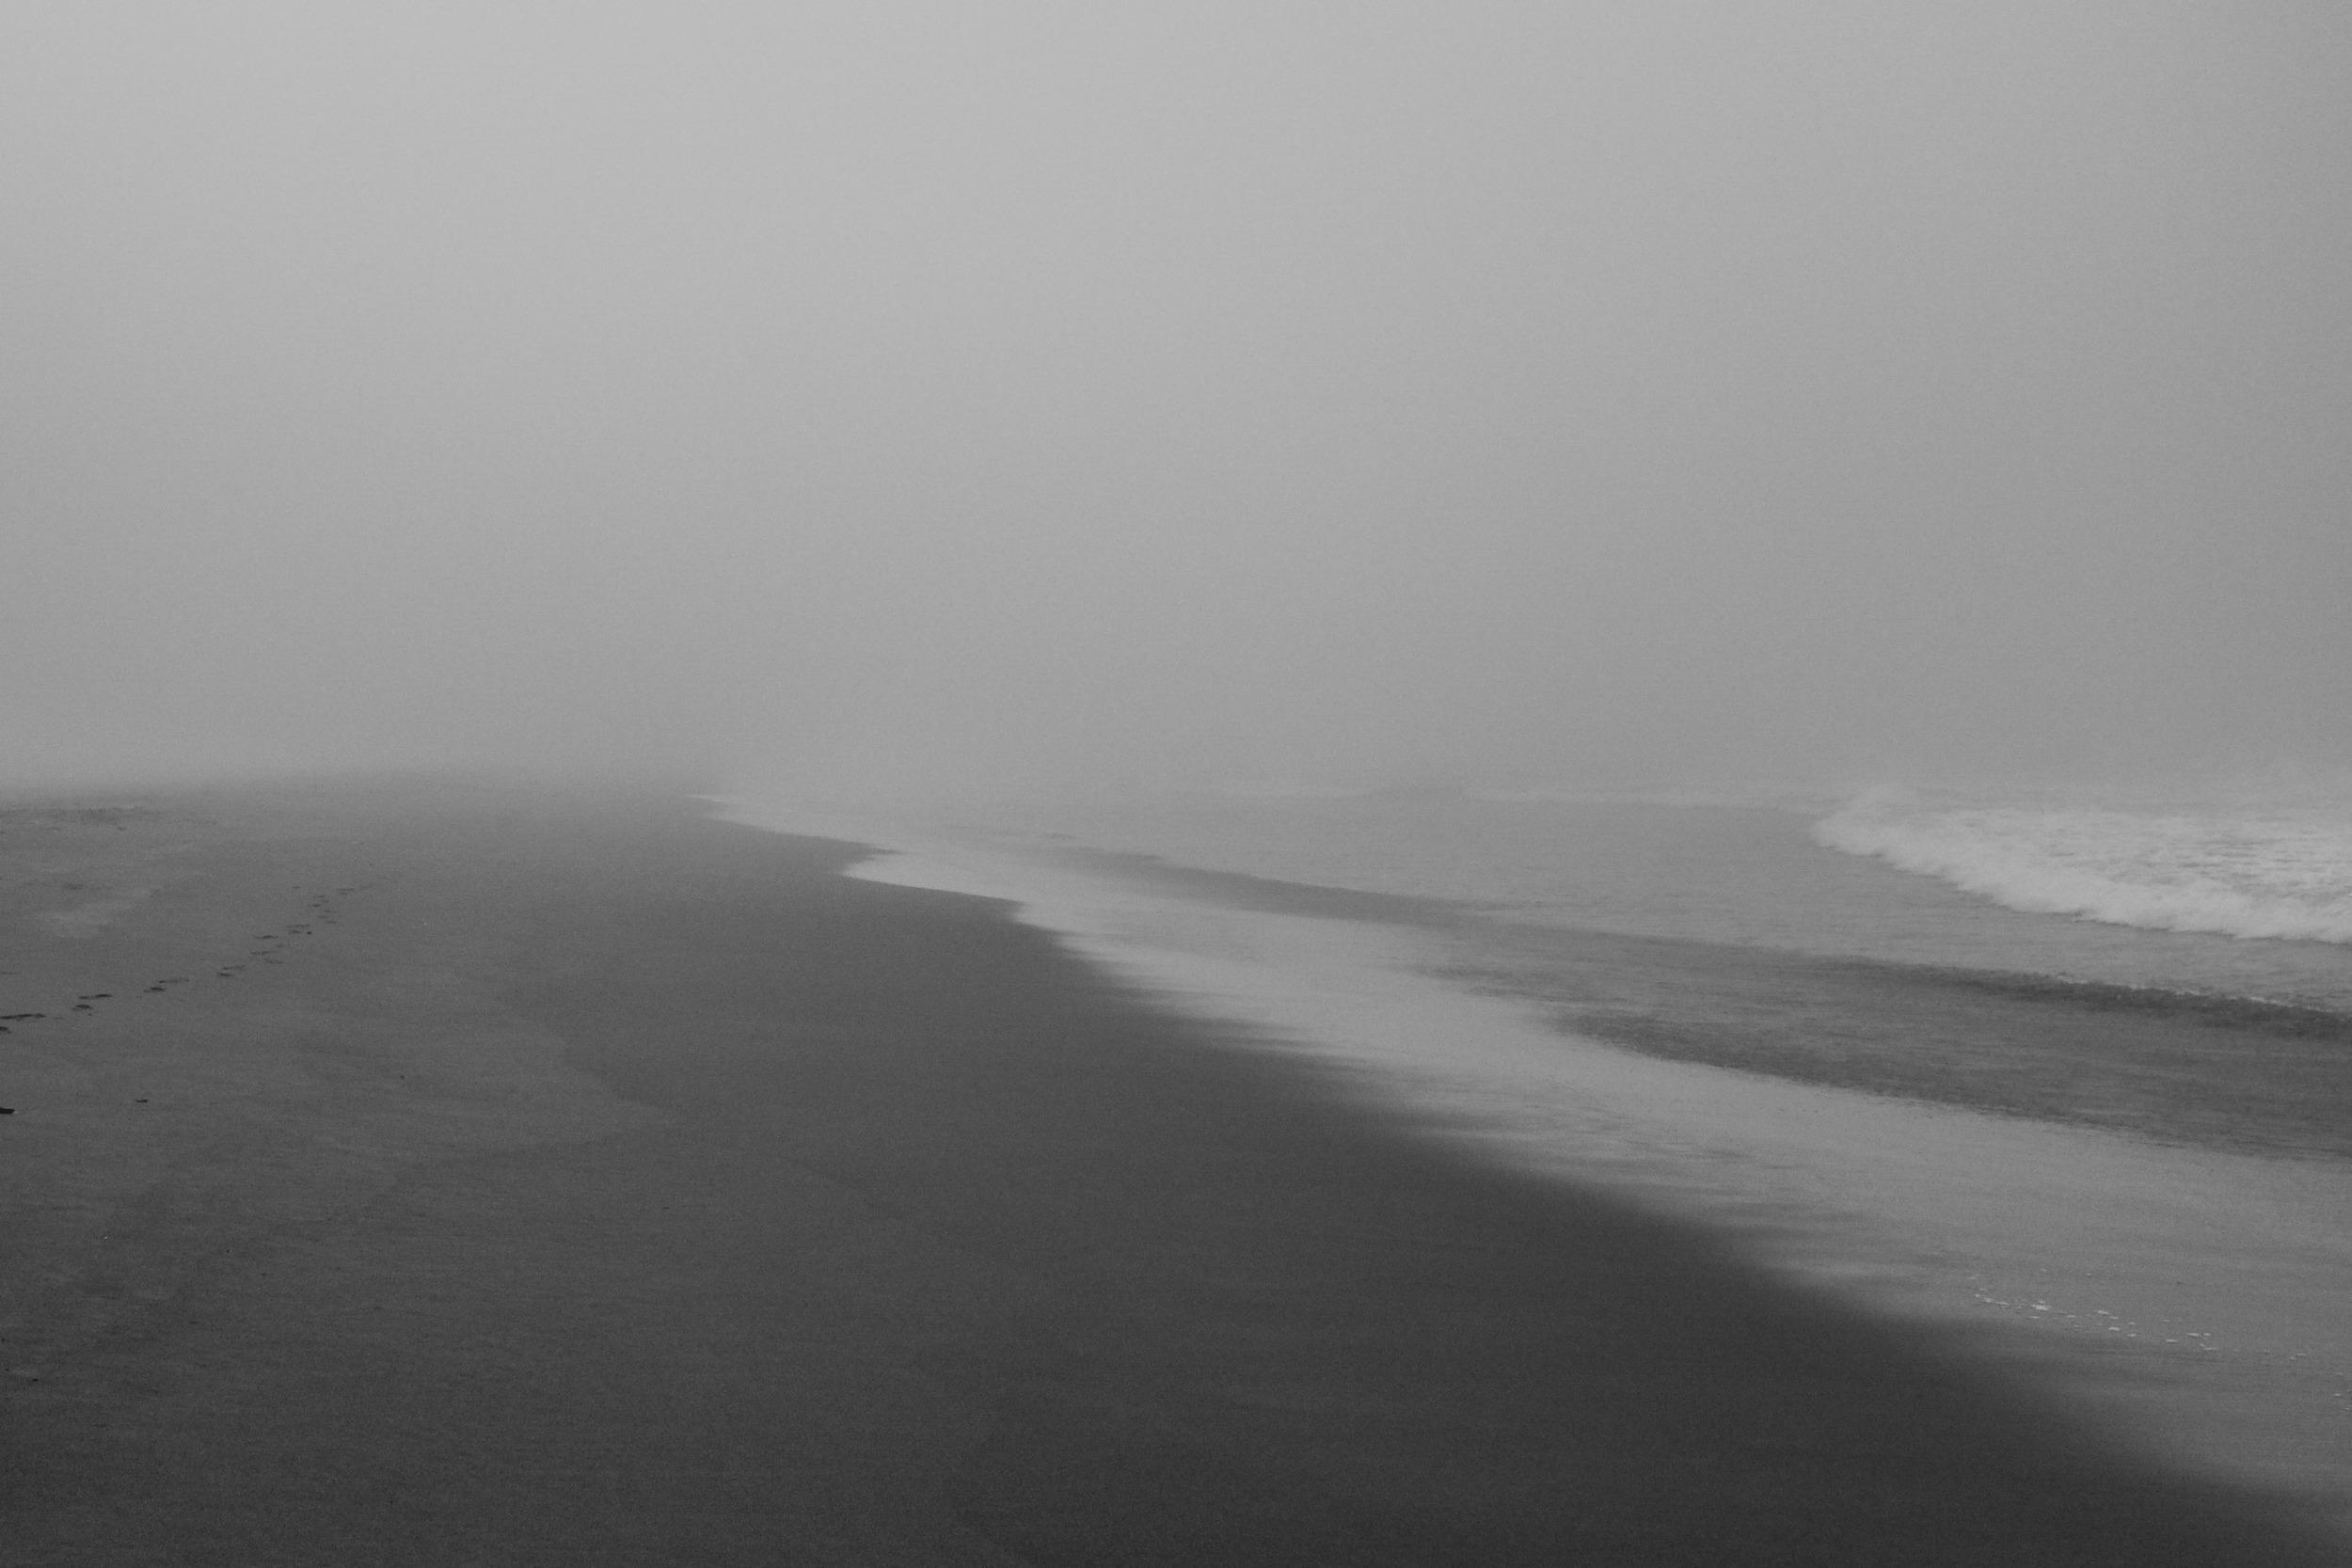 Black-Bear-Brand-Tilley-Surfboards-Water-Testing-02.jpg